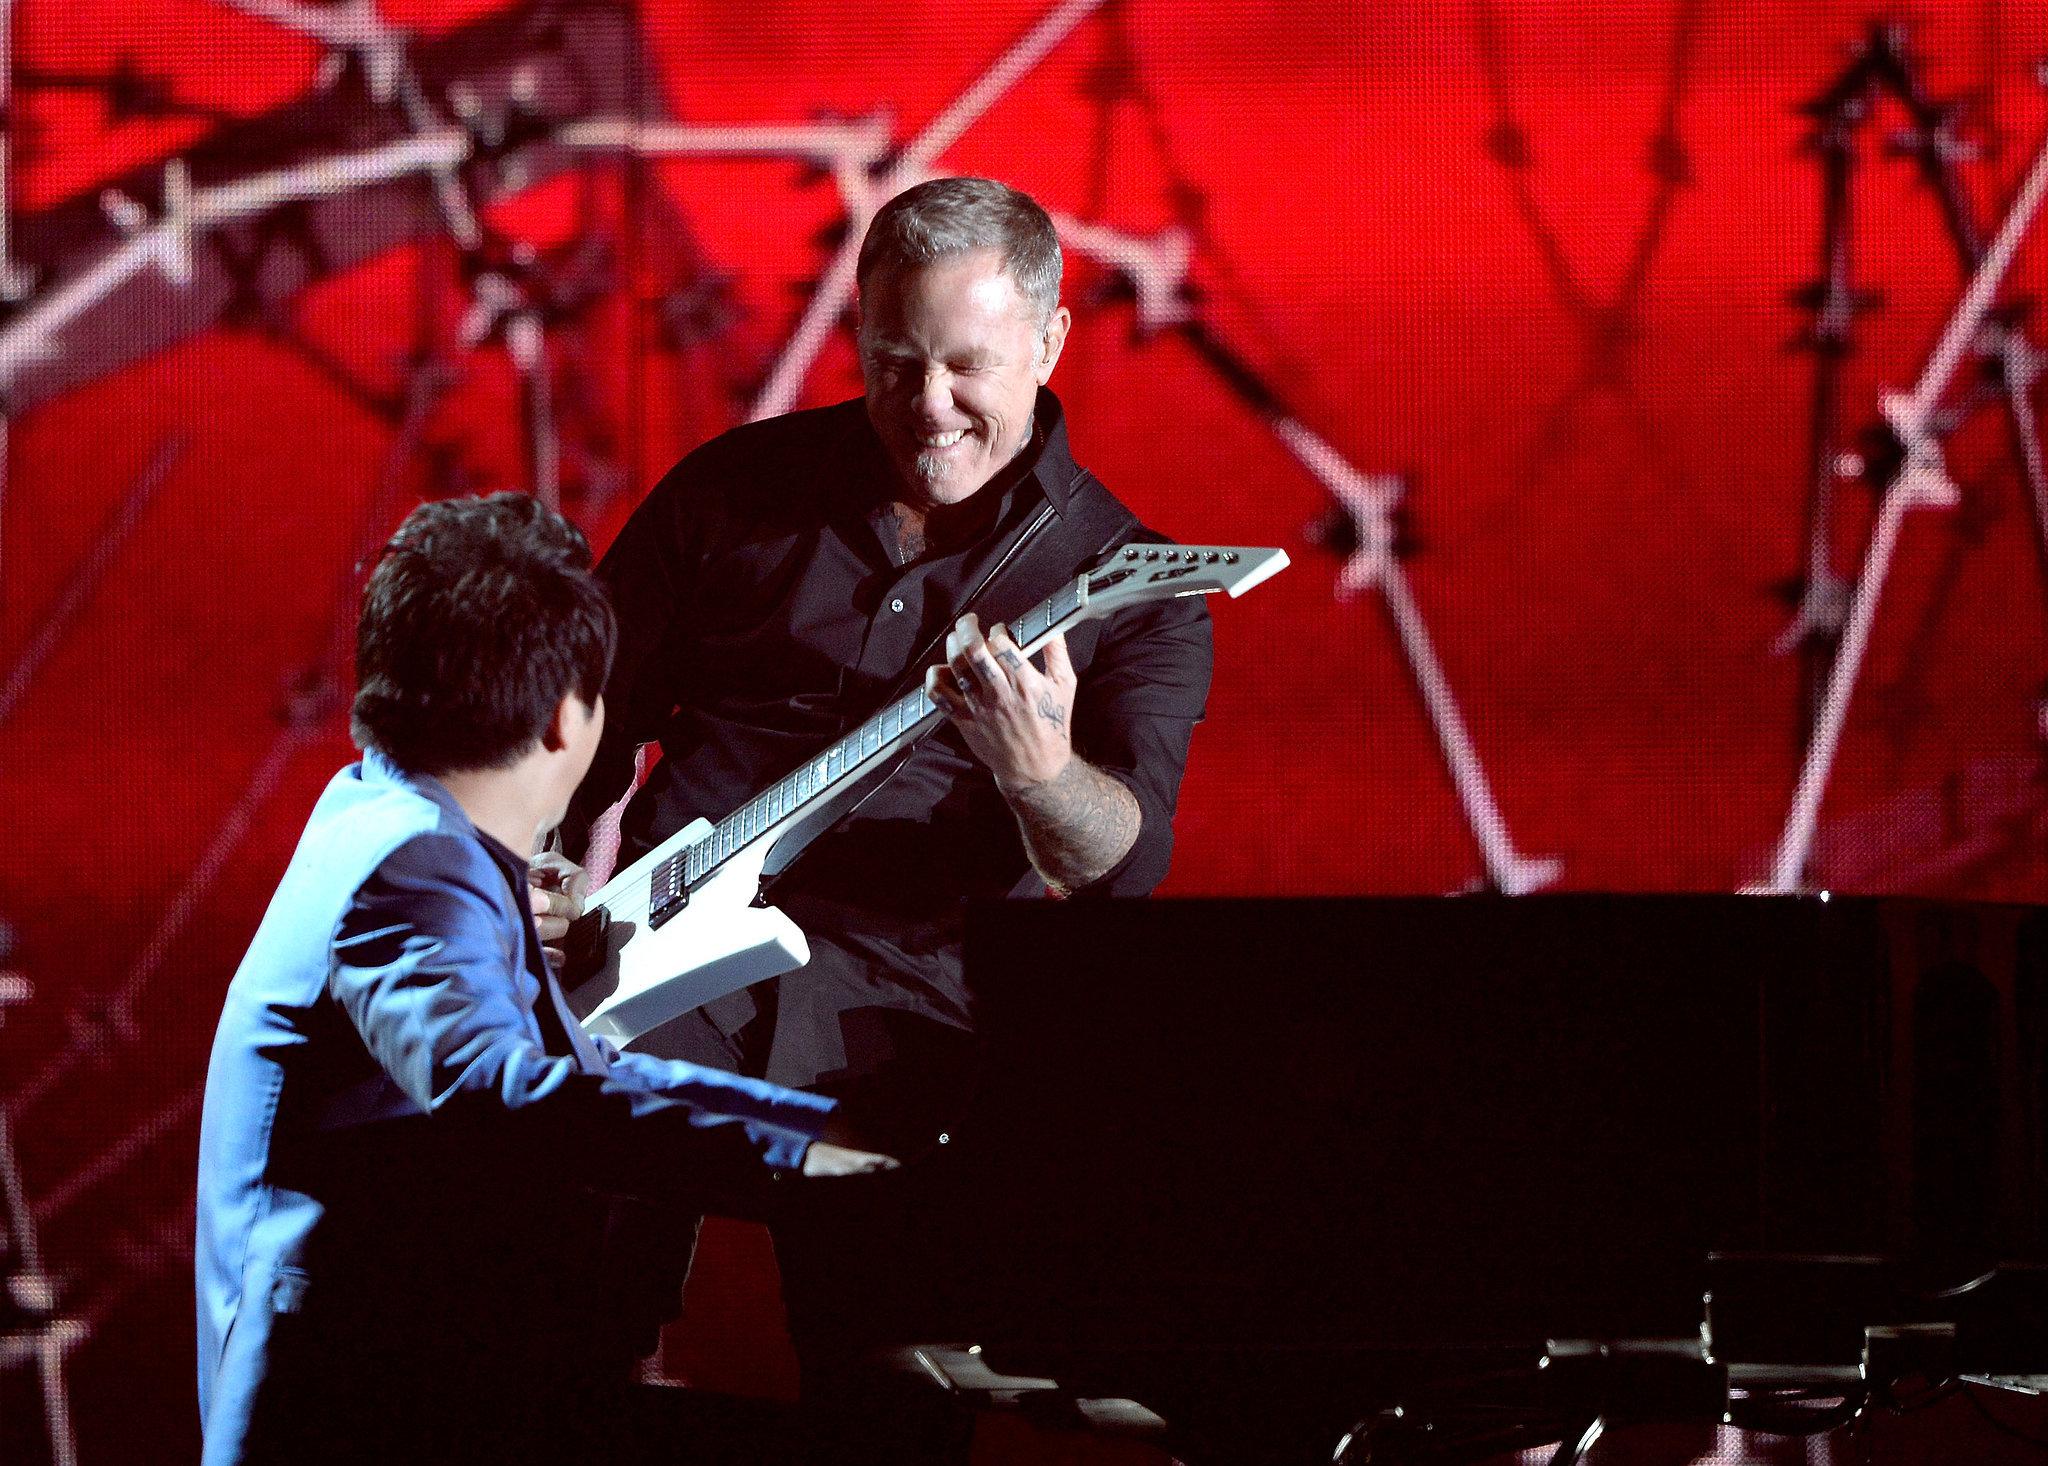 Metallica's James Hetfield and pianist Lang Lang performed together.